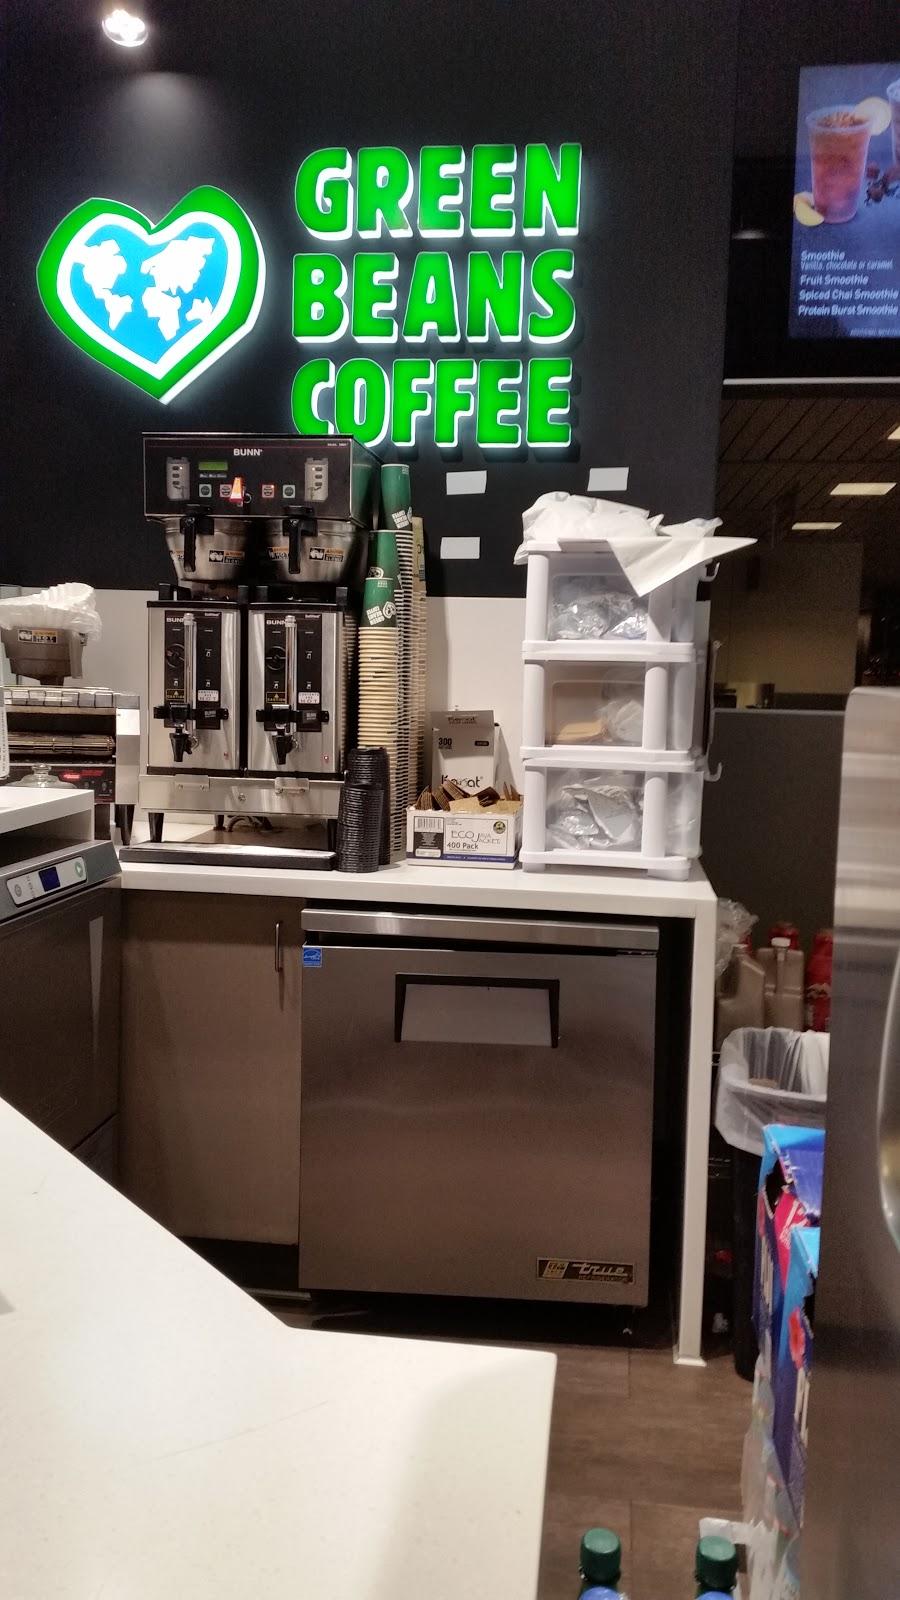 Green Beans Coffee - cafe  | Photo 4 of 9 | Address: Newark, NJ 07114, USA | Phone: (973) 733-2211